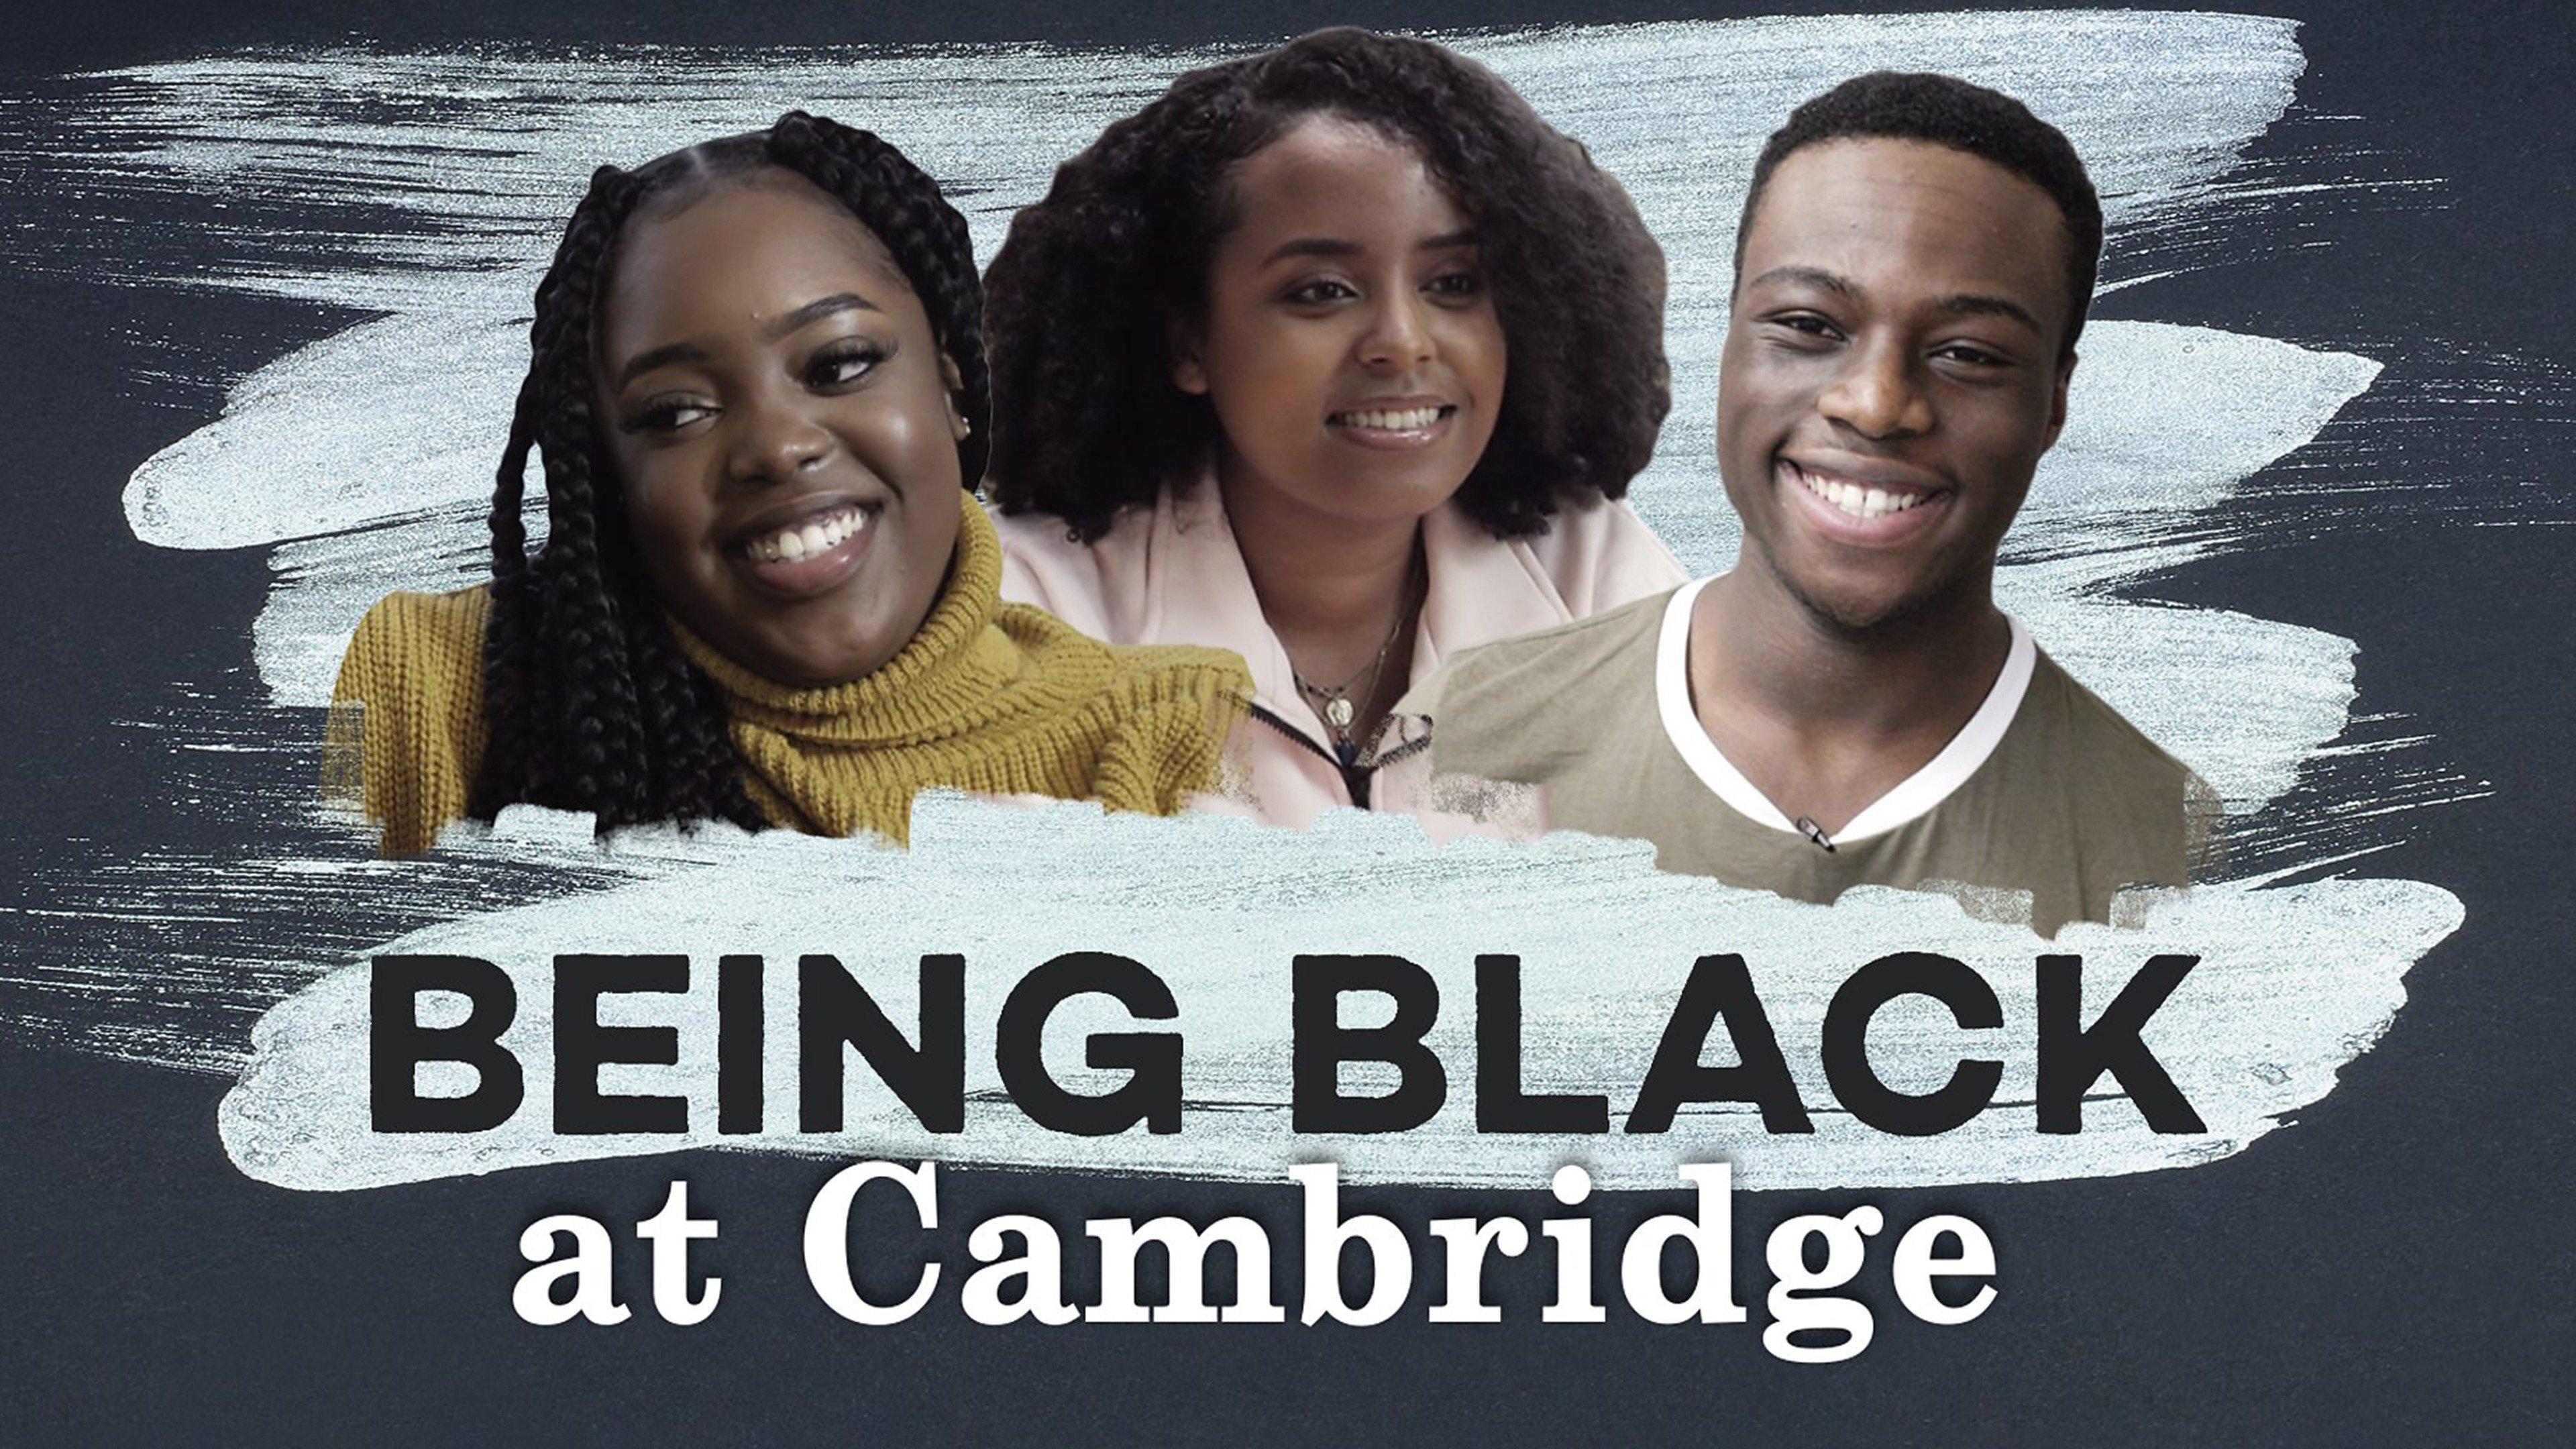 Being Black at Cambridge